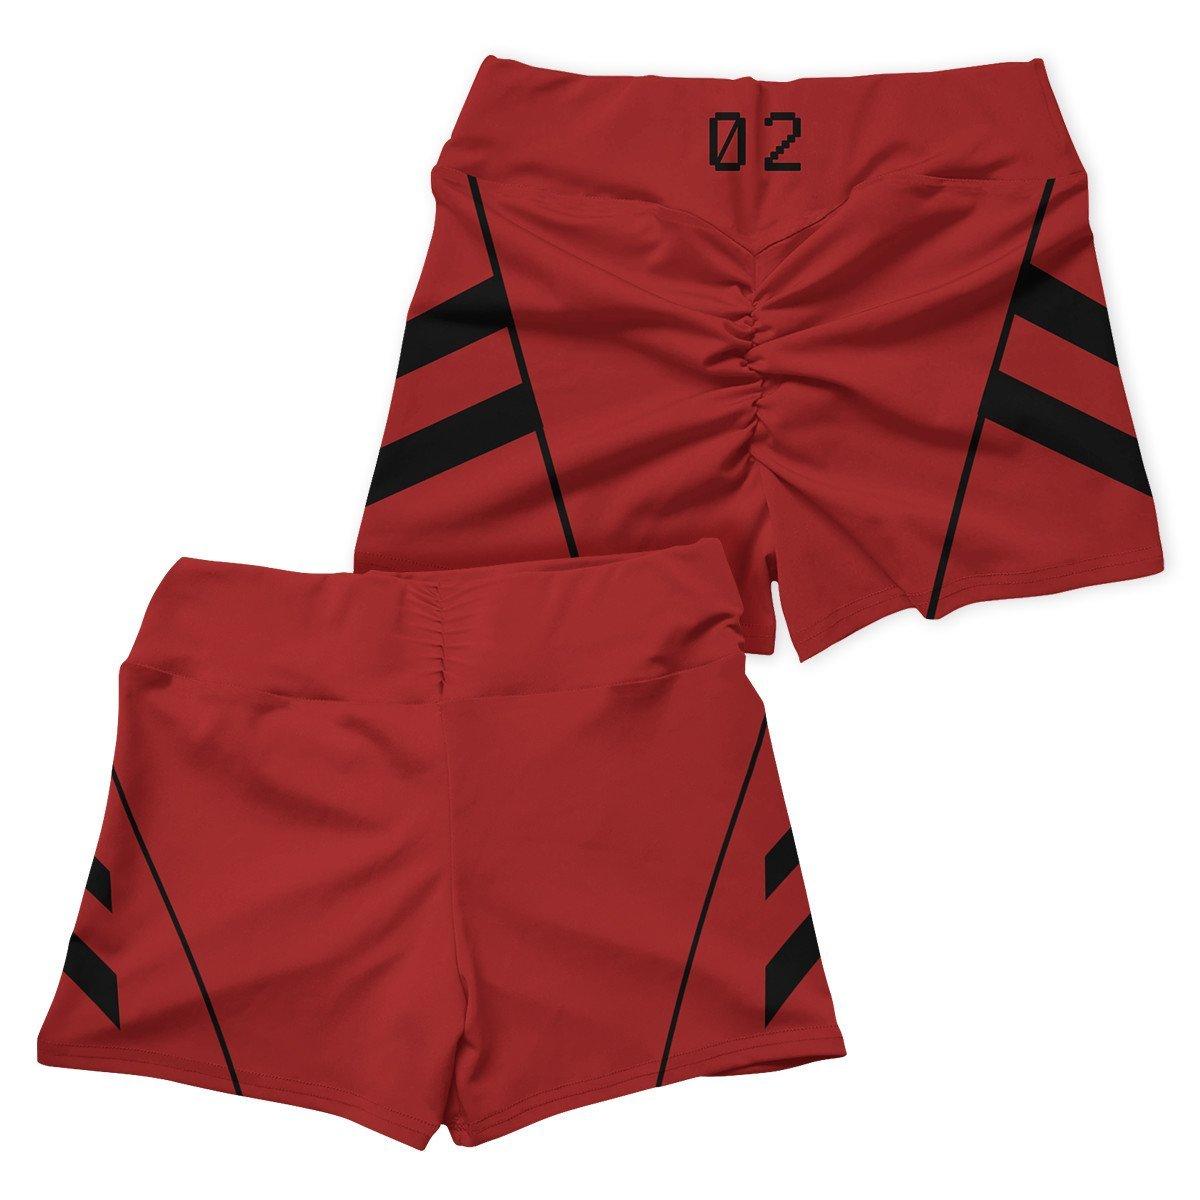 neon genesis asuka active wear set 678182 - Anime Swimsuits